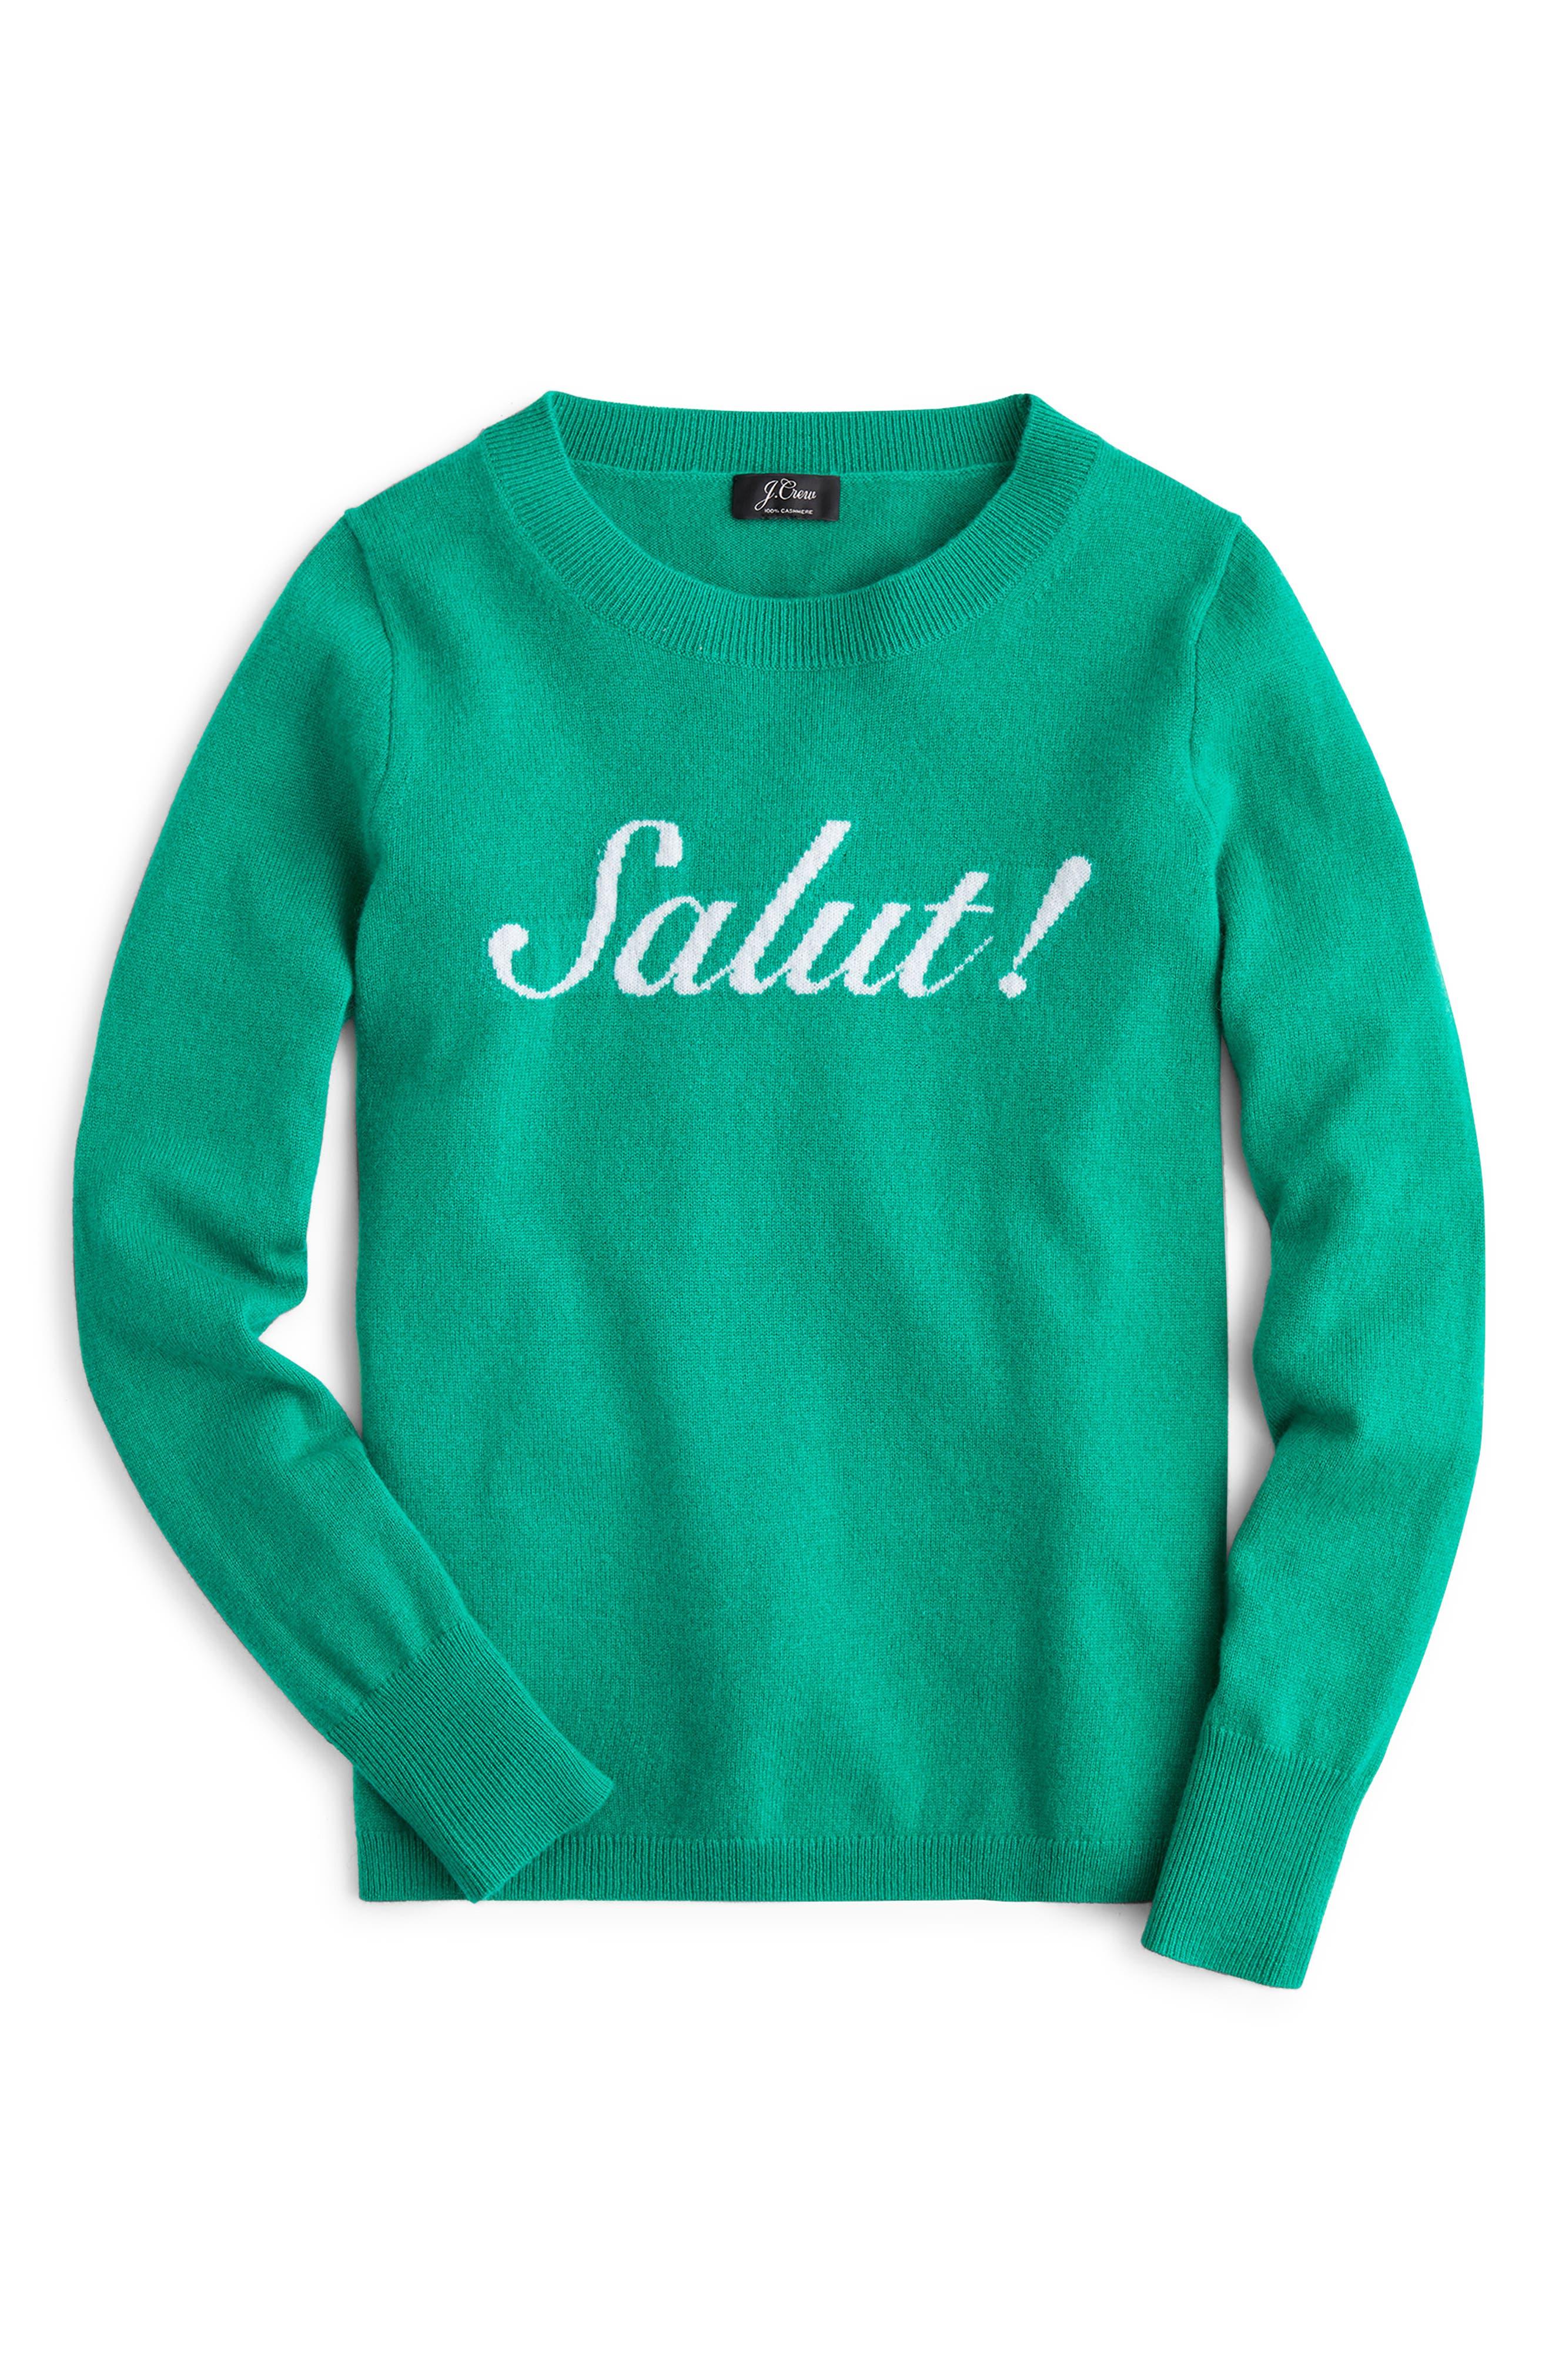 Salut Cashmere Sweater,                             Main thumbnail 1, color,                             300